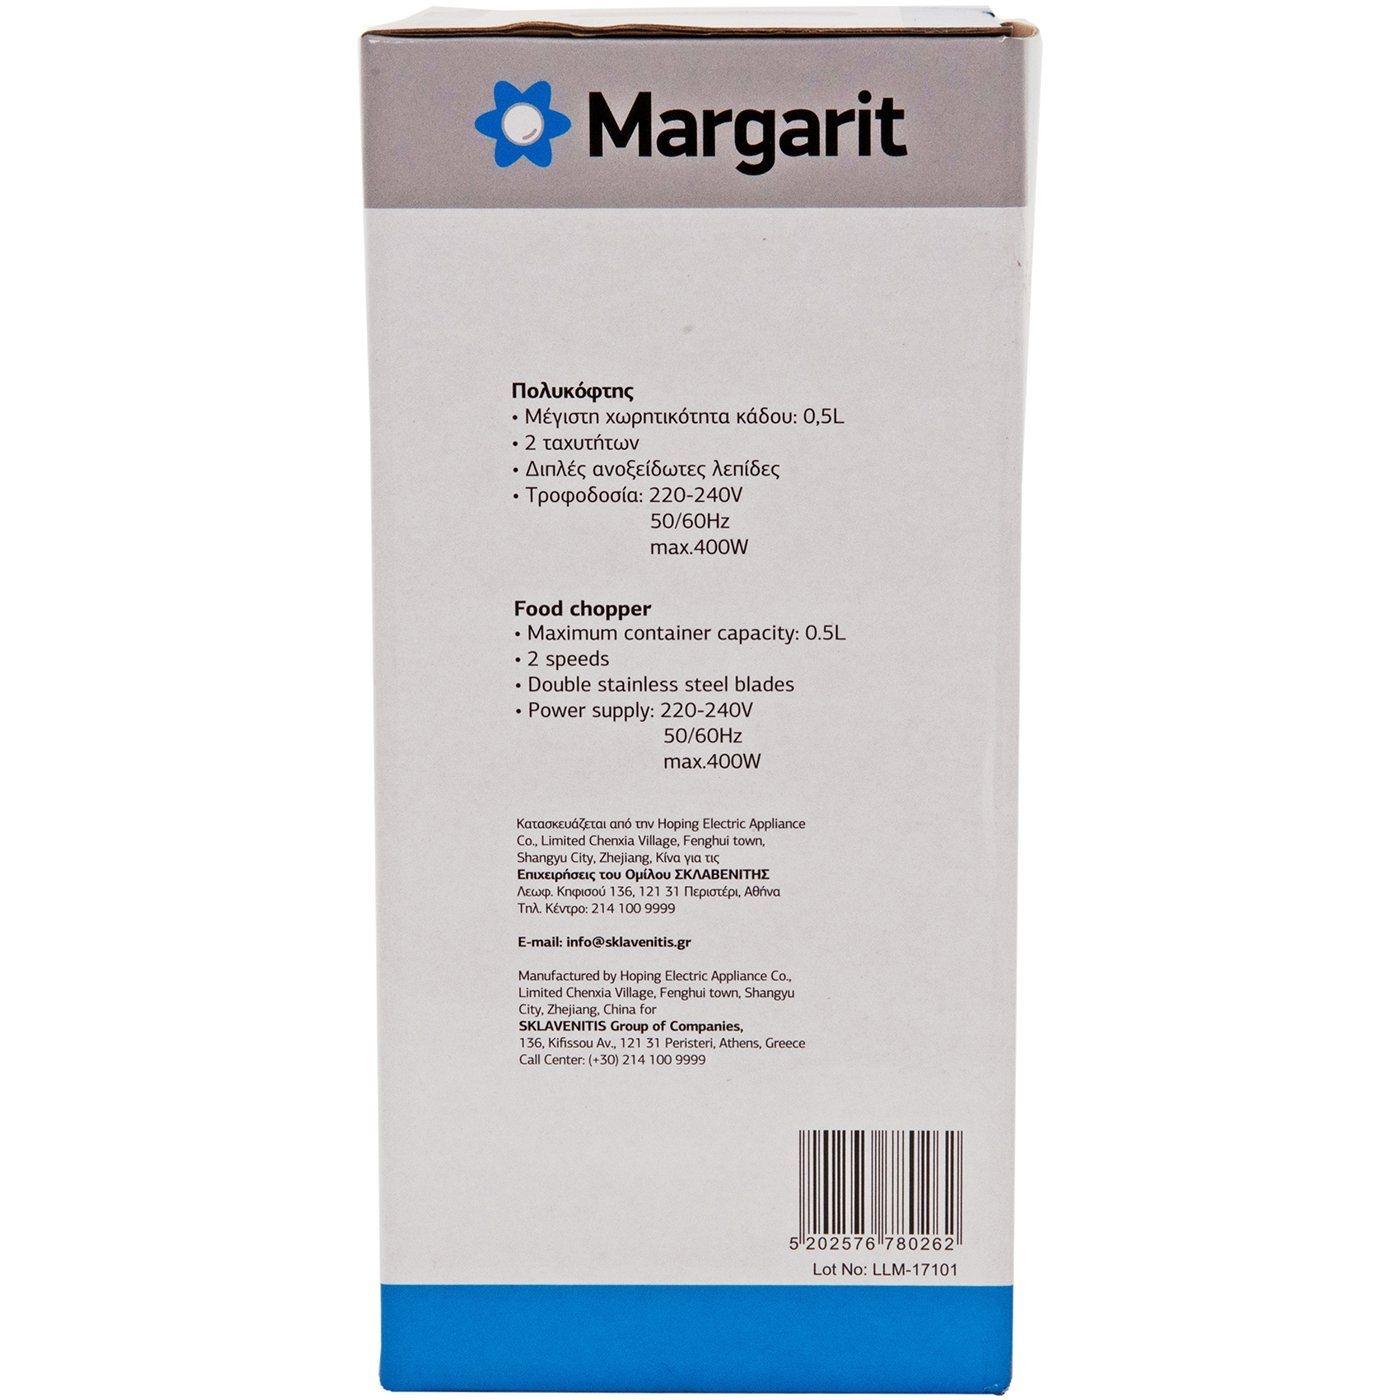 6881b1d7eee5 Πολυκόφτης Margarit multi οικιακός 400W